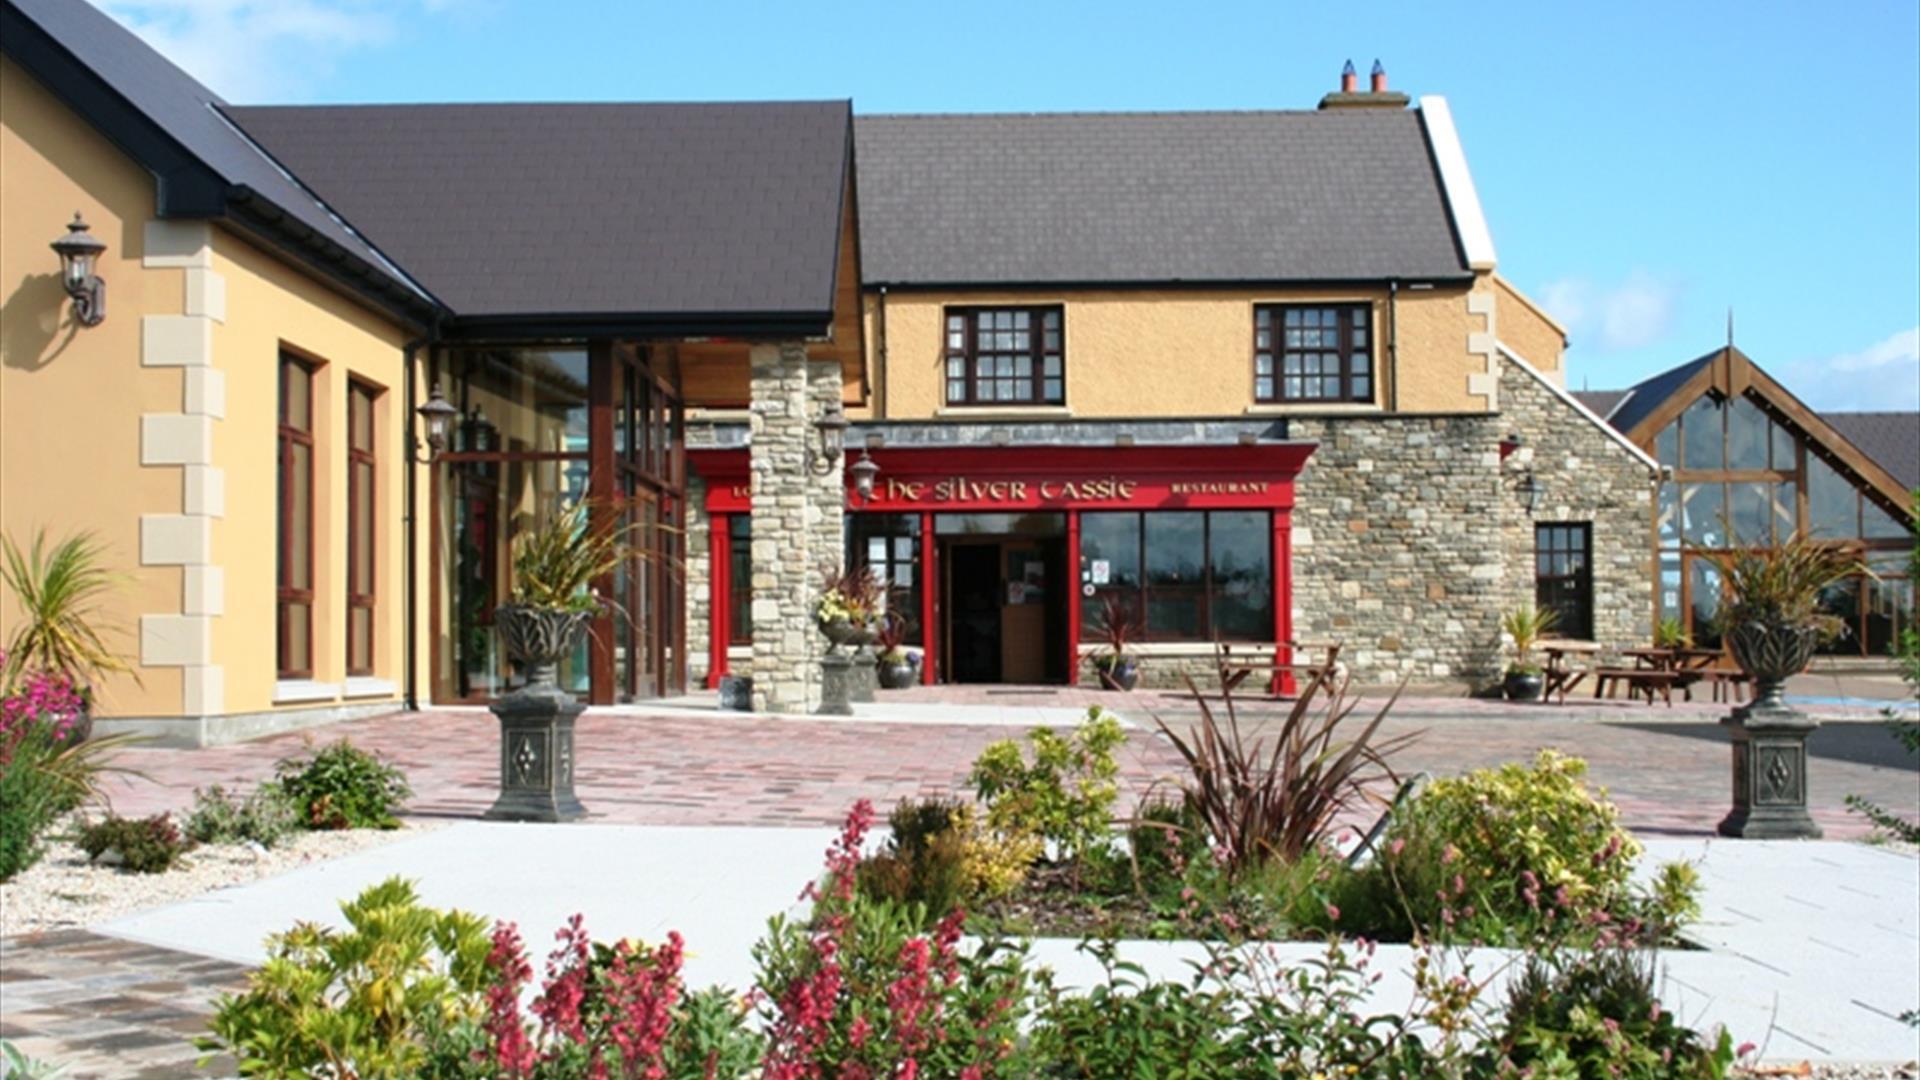 Silver Tassie Hotel, in Letterkenny.